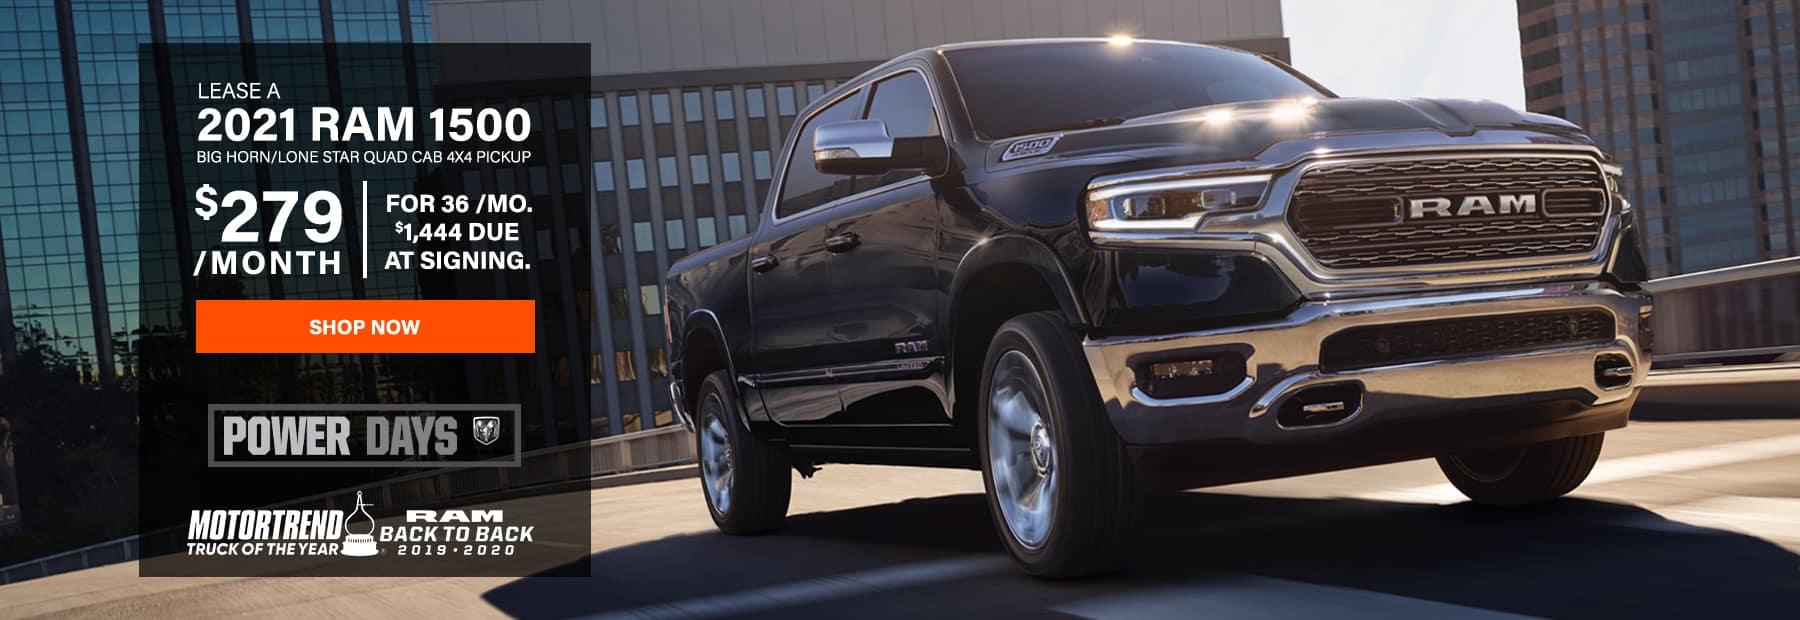 Lease a 2021 Ram 1500 Big Horn / Lone Star Quad Cab 4x4 Pickup Truck